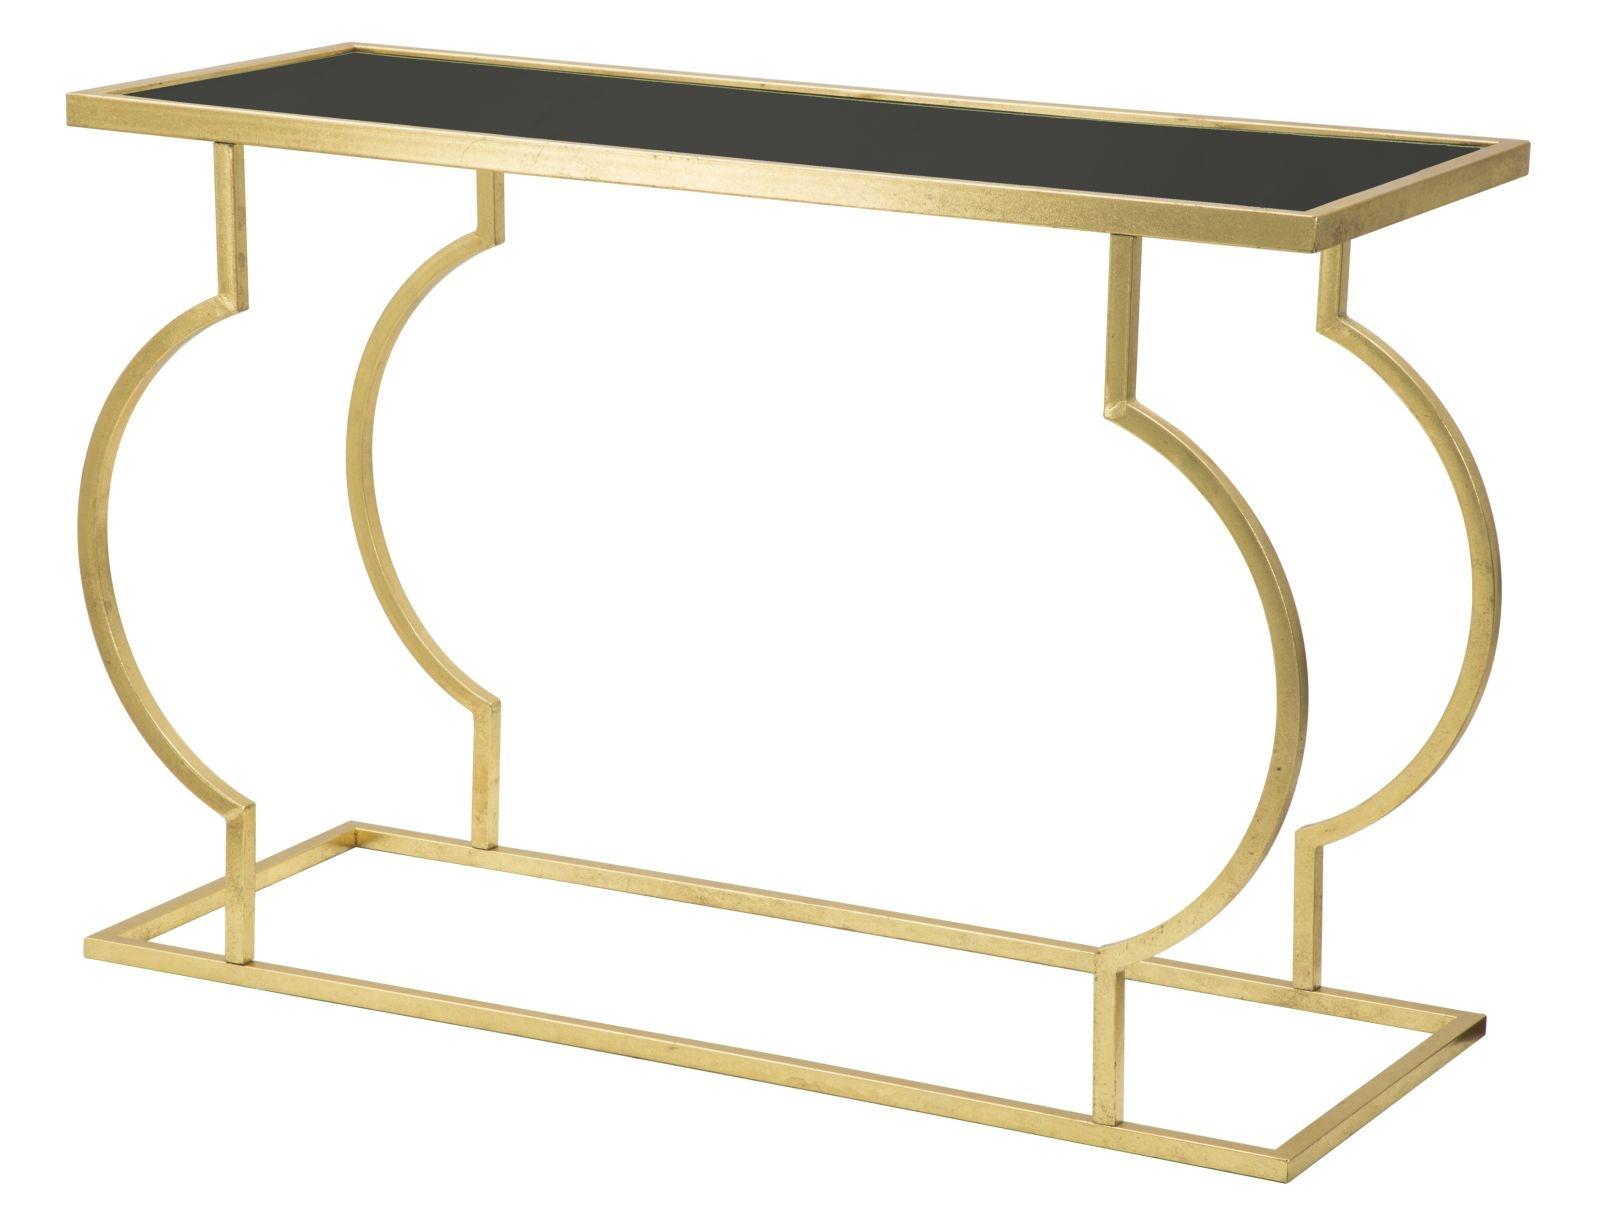 Consola din metal si sticla Egit Gold / Black, l45,5xA120xH81,5 cm